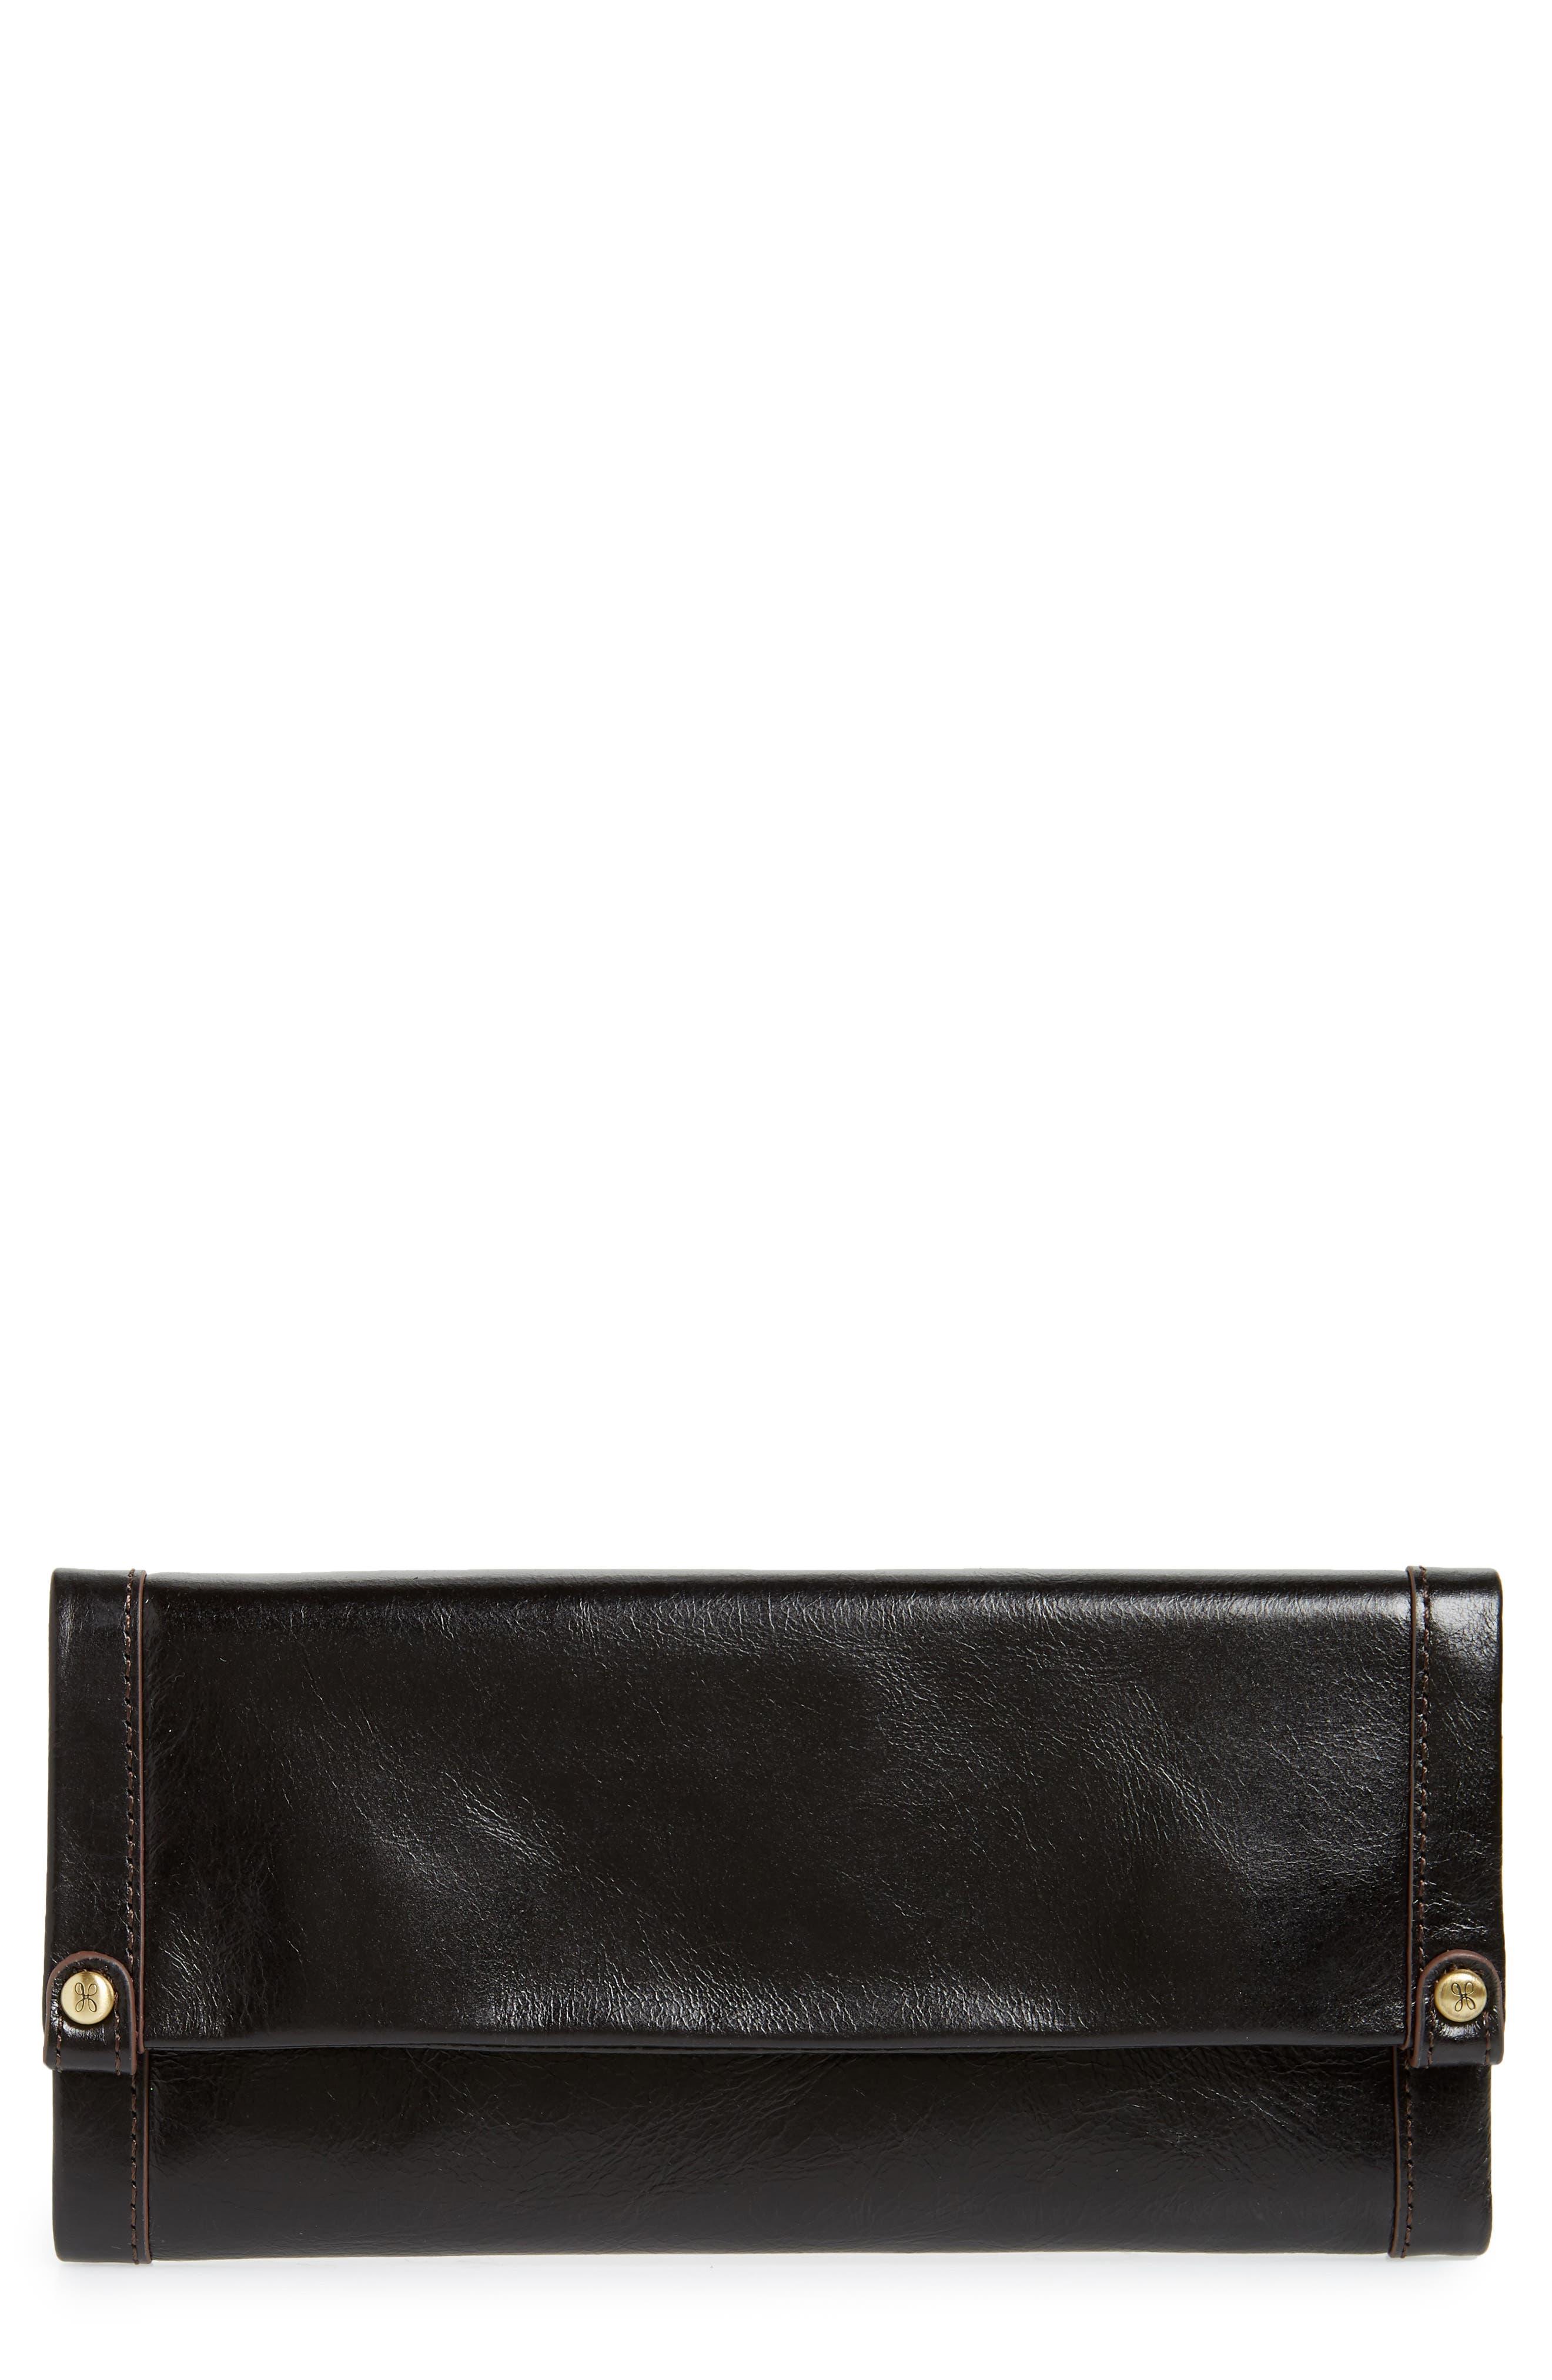 Fable Continental Wallet,                             Main thumbnail 1, color,                             001